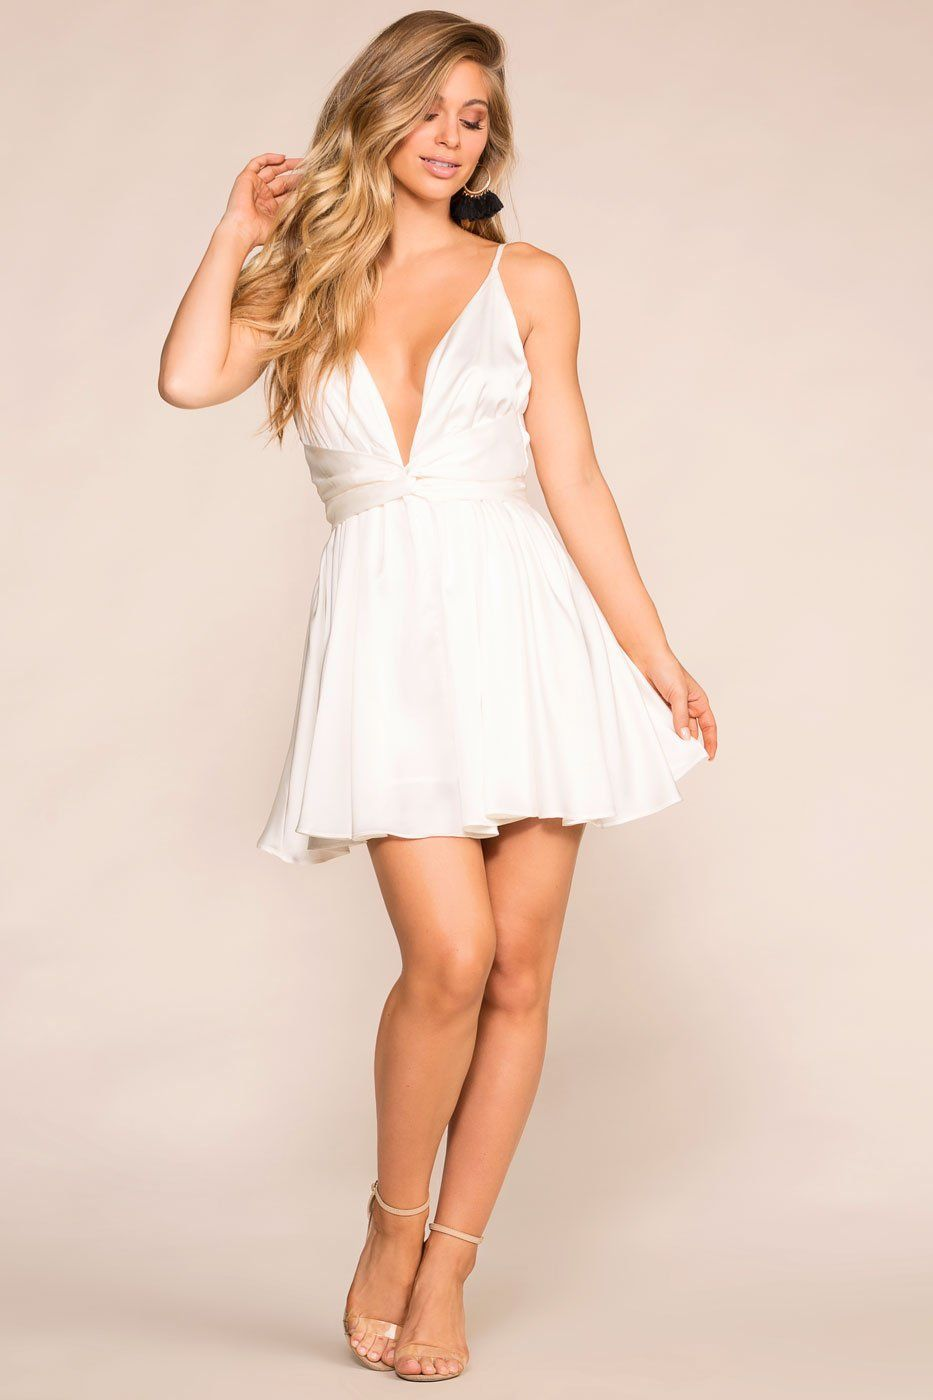 Take The Plunge White Skater Dress In 2020 White Skater Dresses Dresses White Plunge Dress